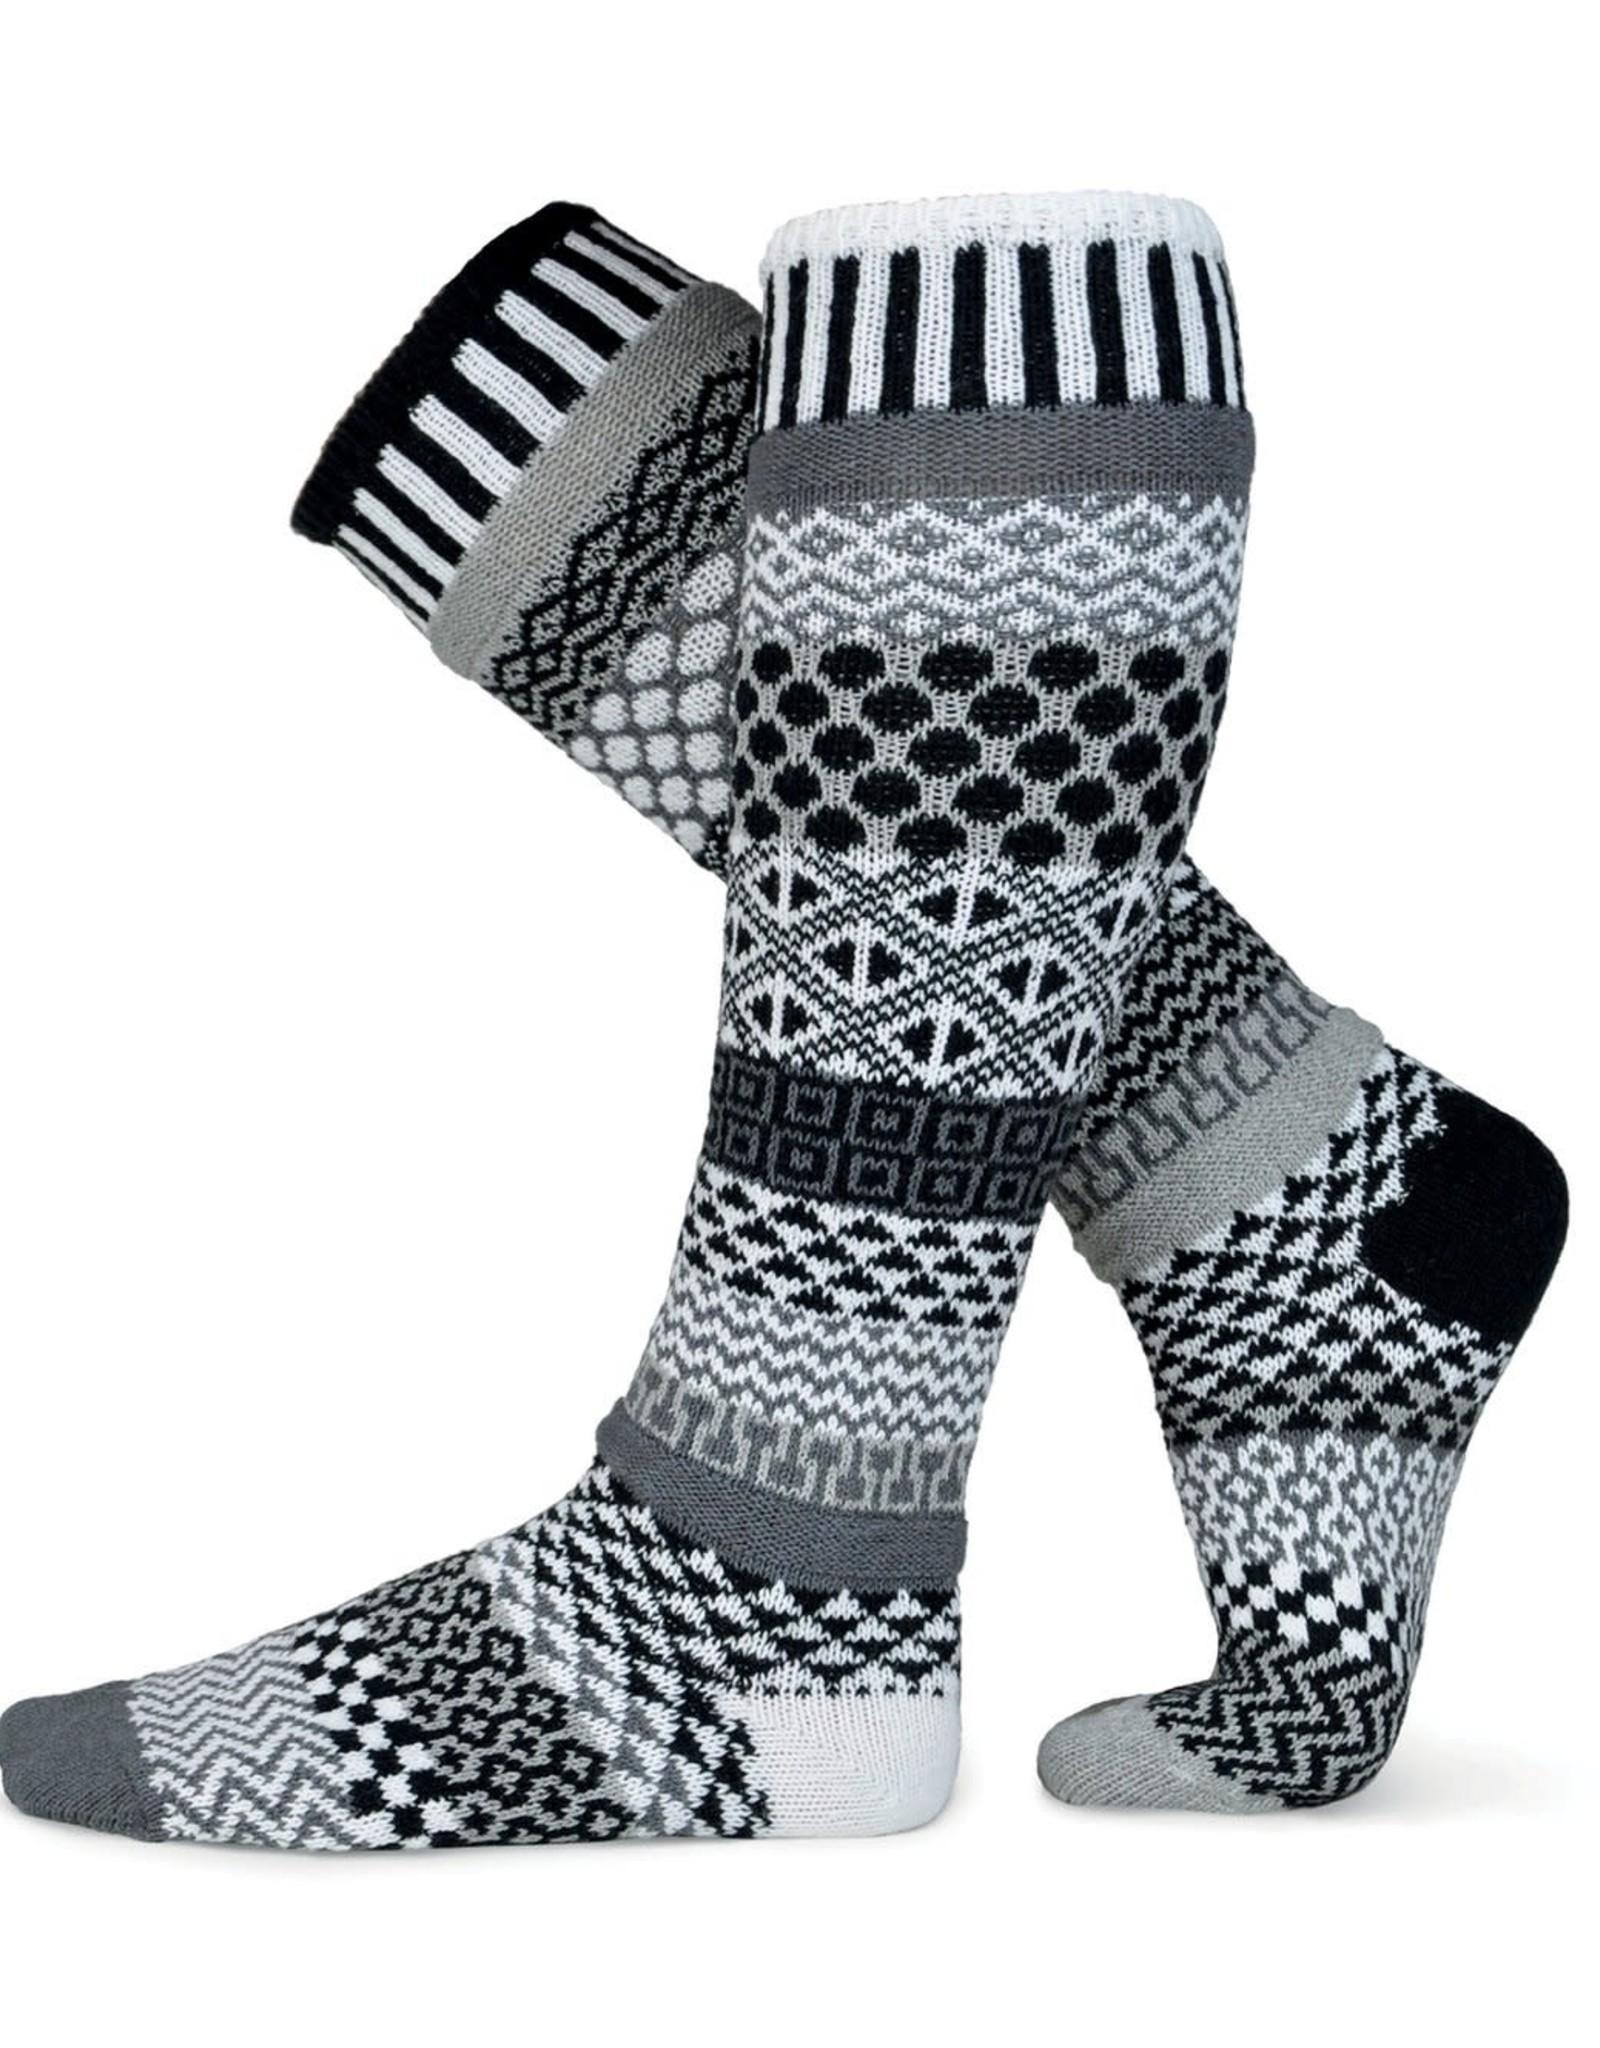 Solmate Solmate | Adult Knee Socks